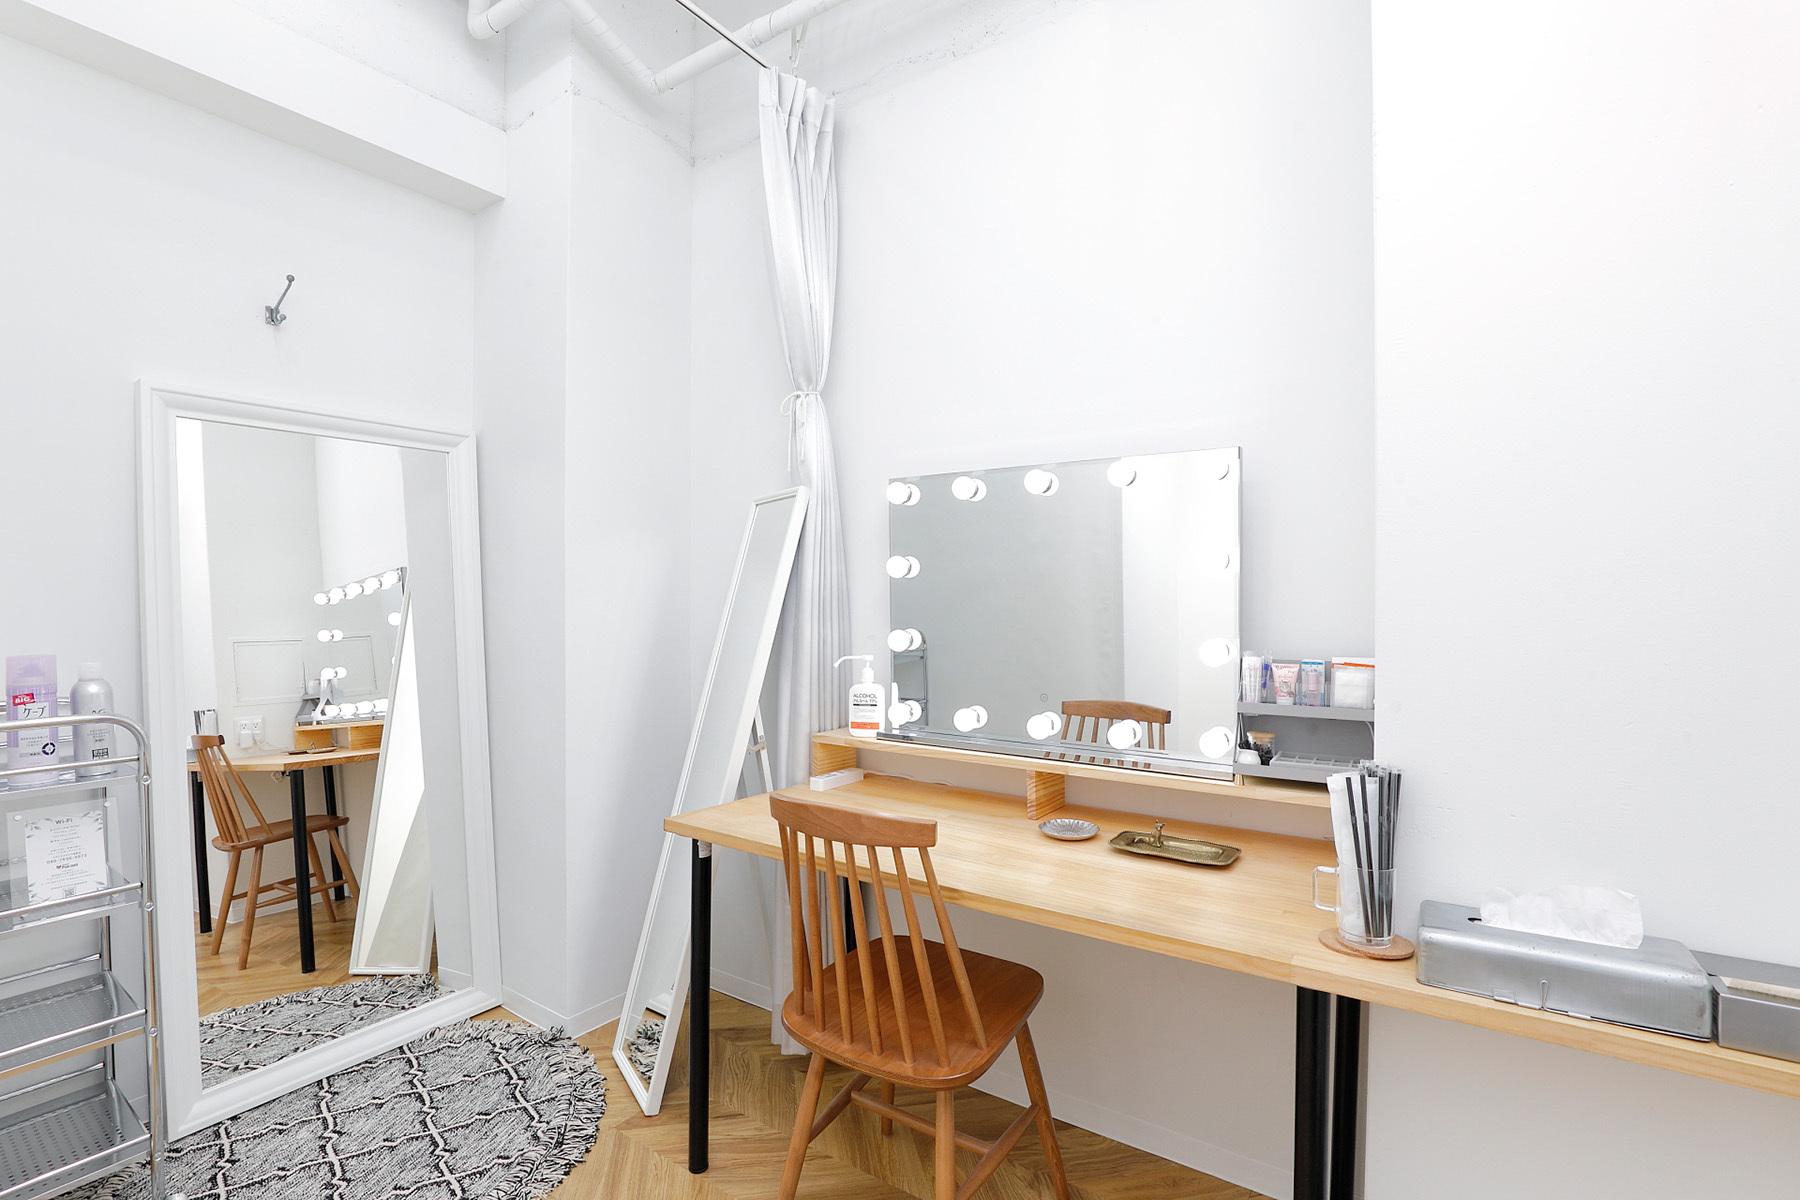 STUDIO FOXTAIL Ast (スタジオ フォックステイル Ast)最新のライブ配信用機材を完備